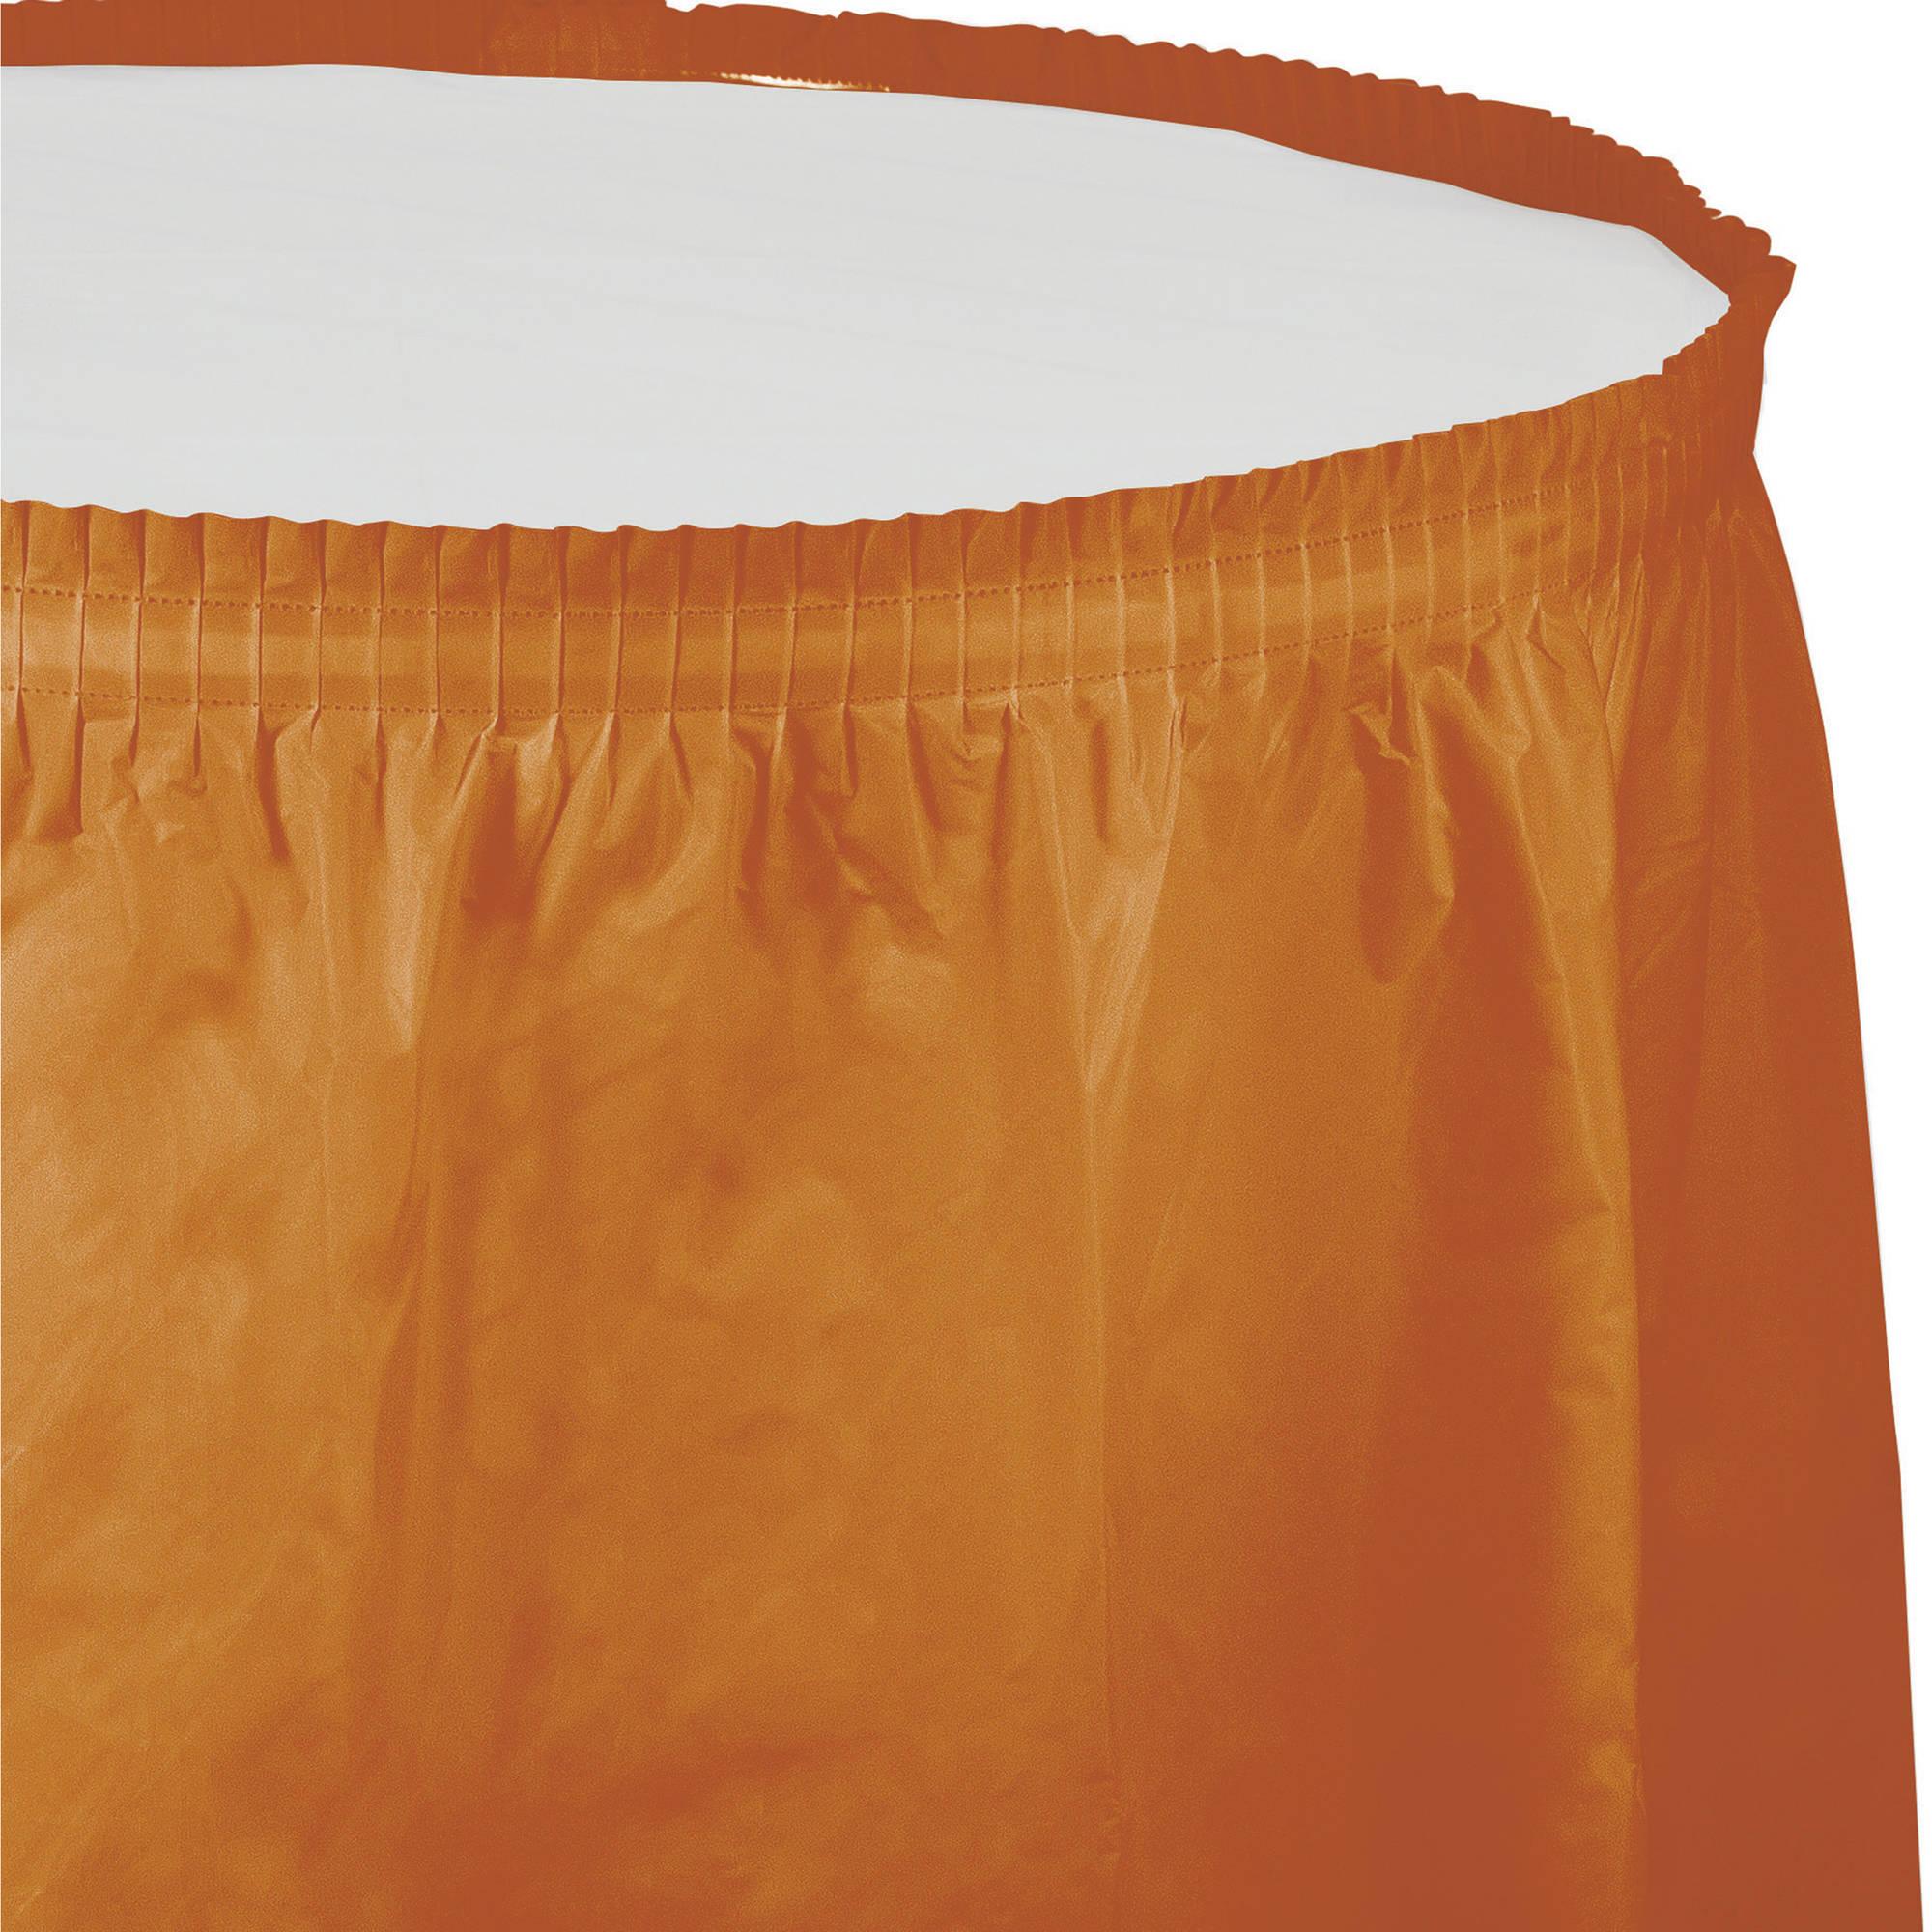 Pumpkin Spice Orange Plastic Tableskirt, each